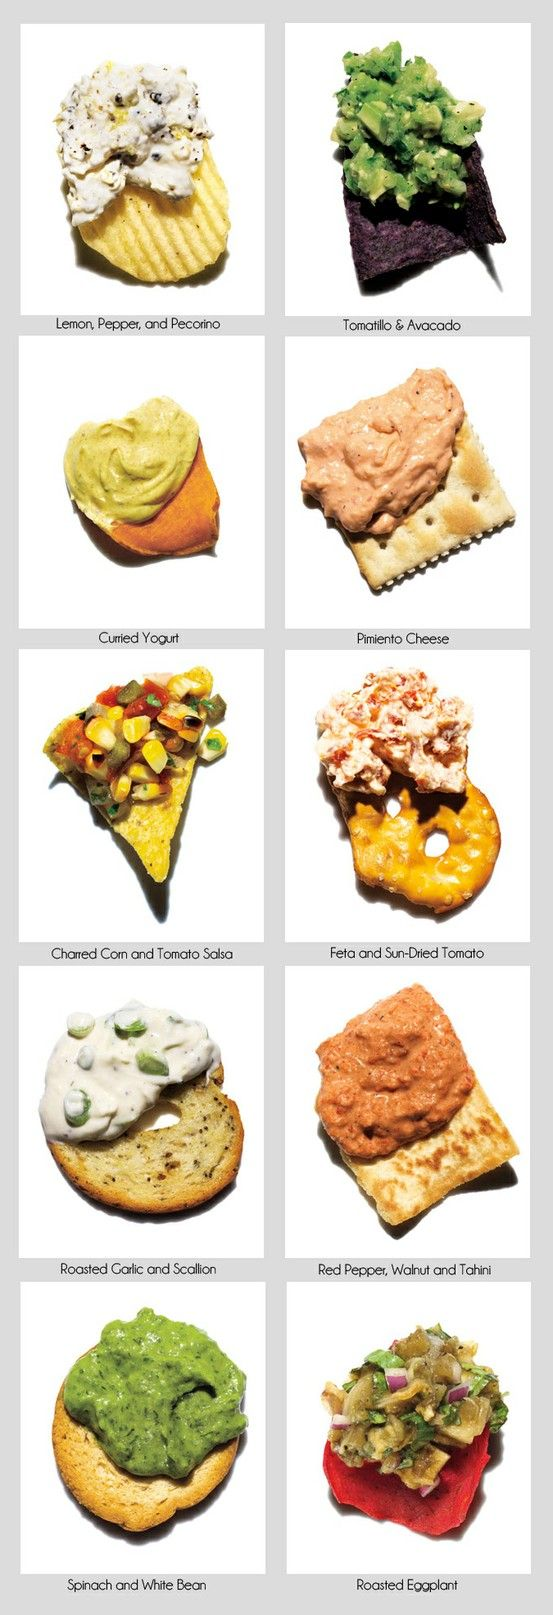 10 Gluten Free Dips-Fresh Picked Inspiration {7/20/12}   Picklee